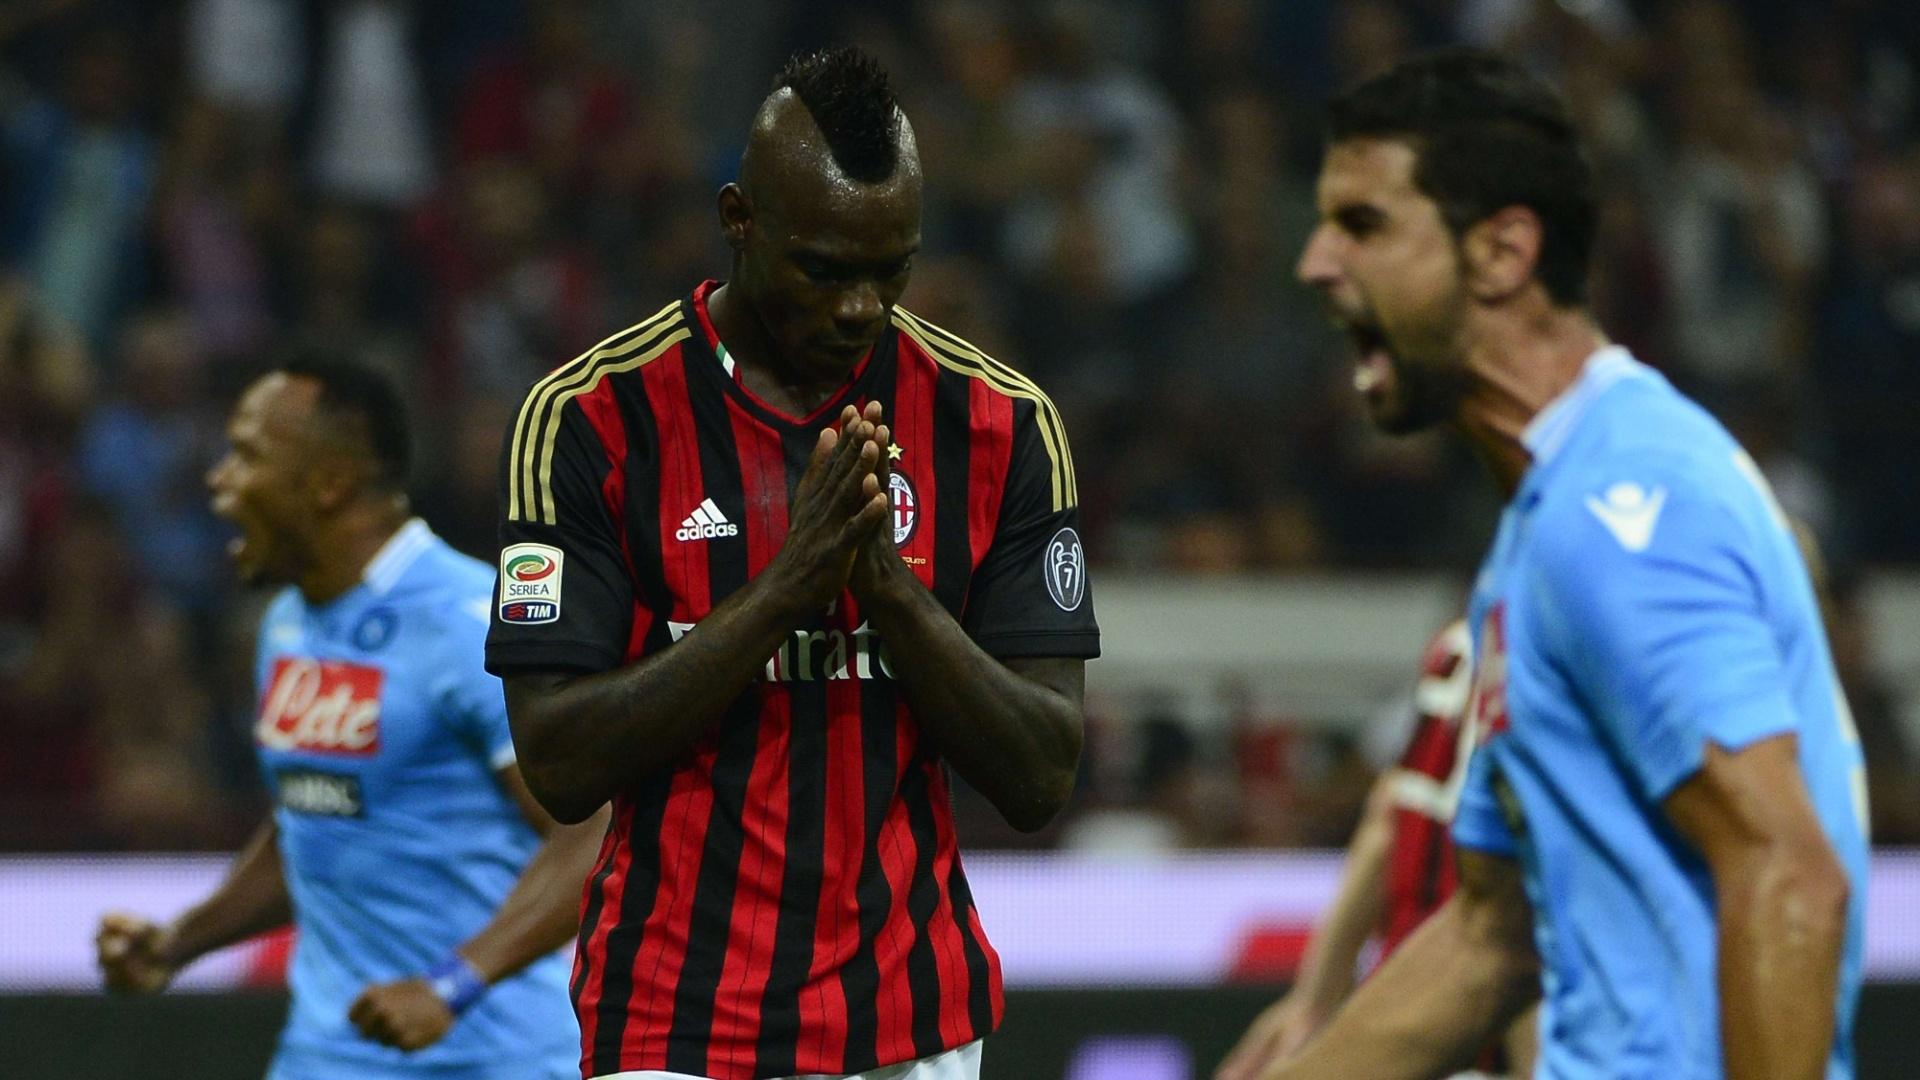 22.set.2013 - Balotelli perde seu primeiro pênalti no jogo contra o Napoli